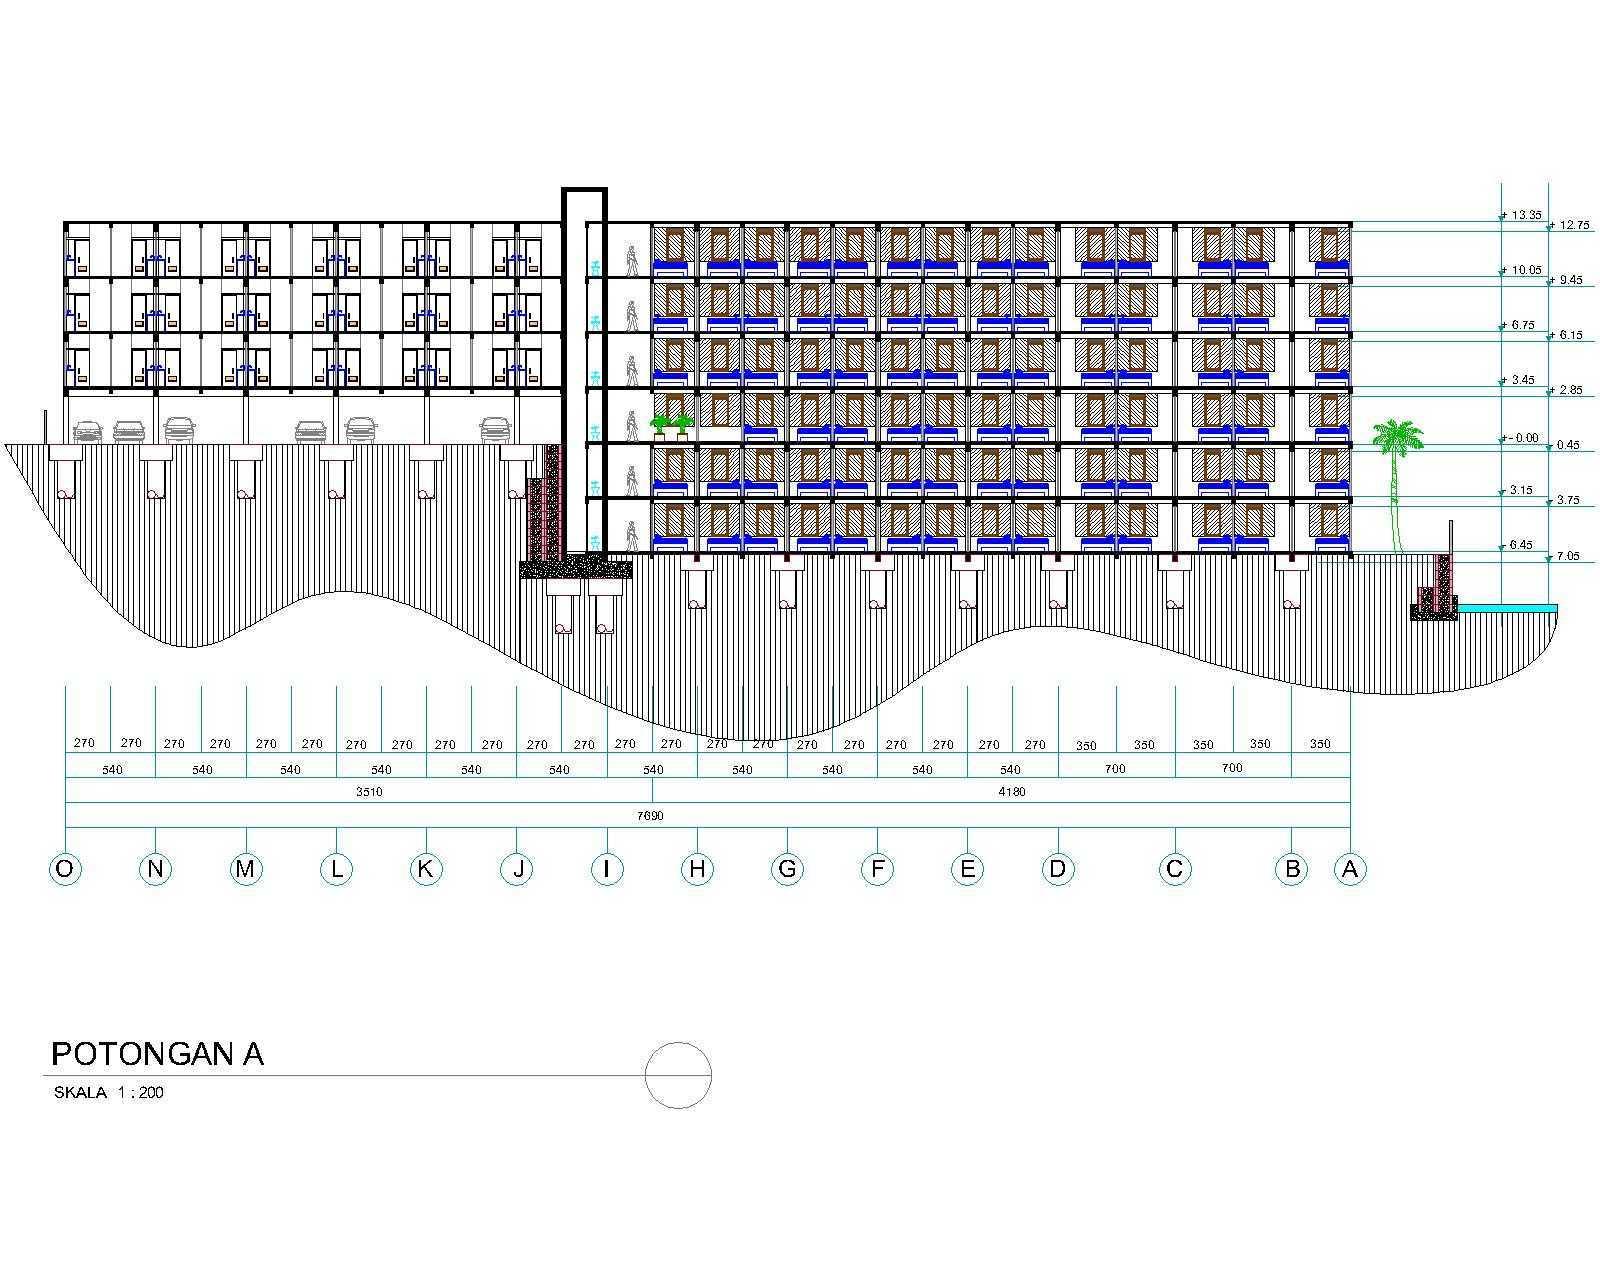 Cv. Infinity Build, Design, Property Pondokan Ciumbuleuit Ciumbuleuit, Cidadap, Kota Bandung, Jawa Barat, Indonesia Ciumbuleuit, Cidadap, Kota Bandung, Jawa Barat, Indonesia Floorplan Minimalist  40060